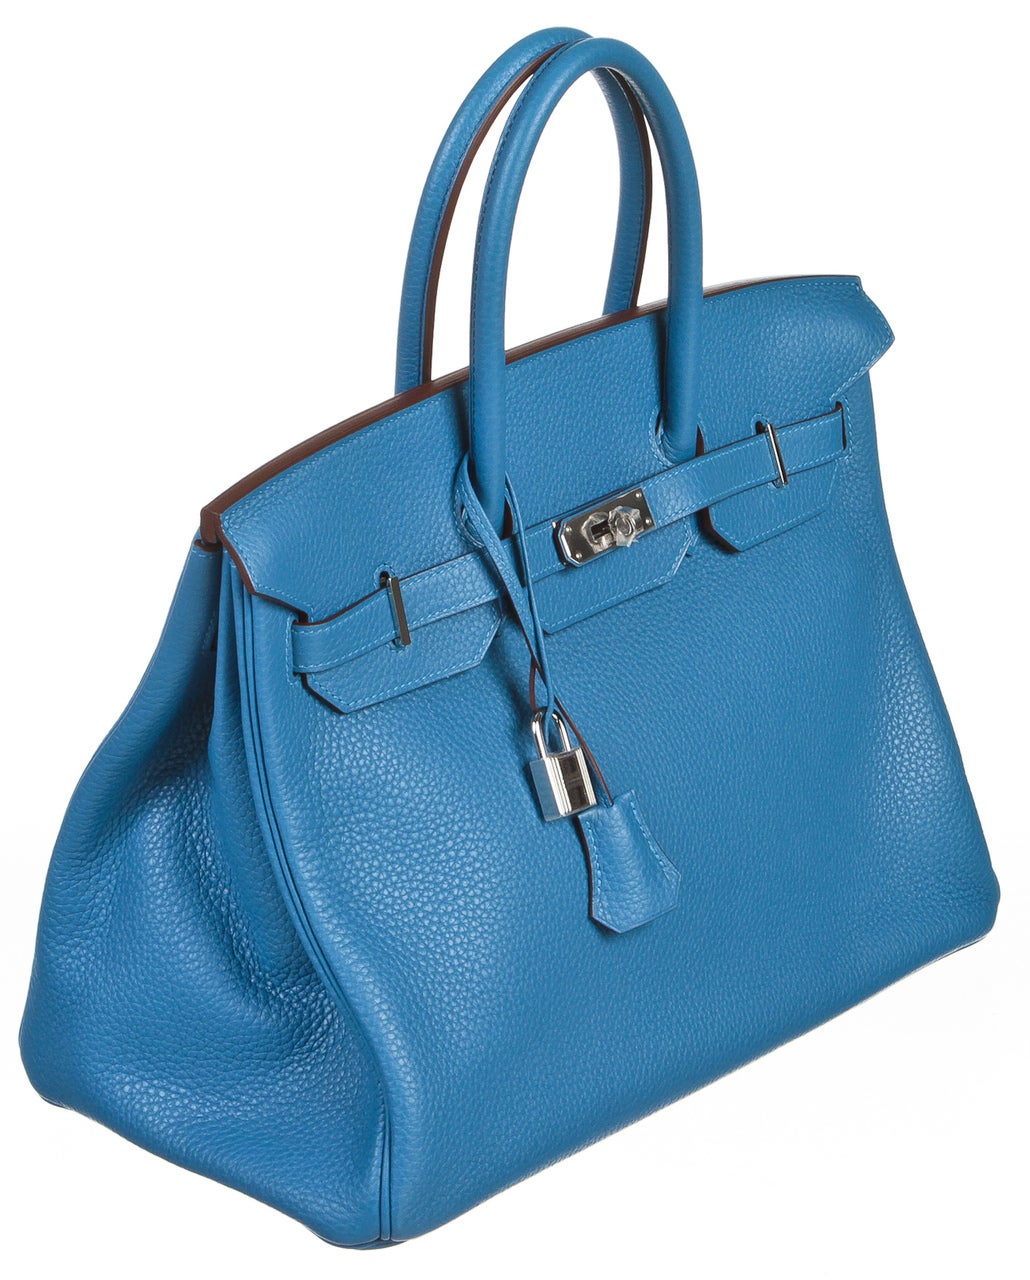 best inexpensive purses - Hermes Mykonos Blue Clemence Leather 35cm Handbag SHW NEW For Sale ...